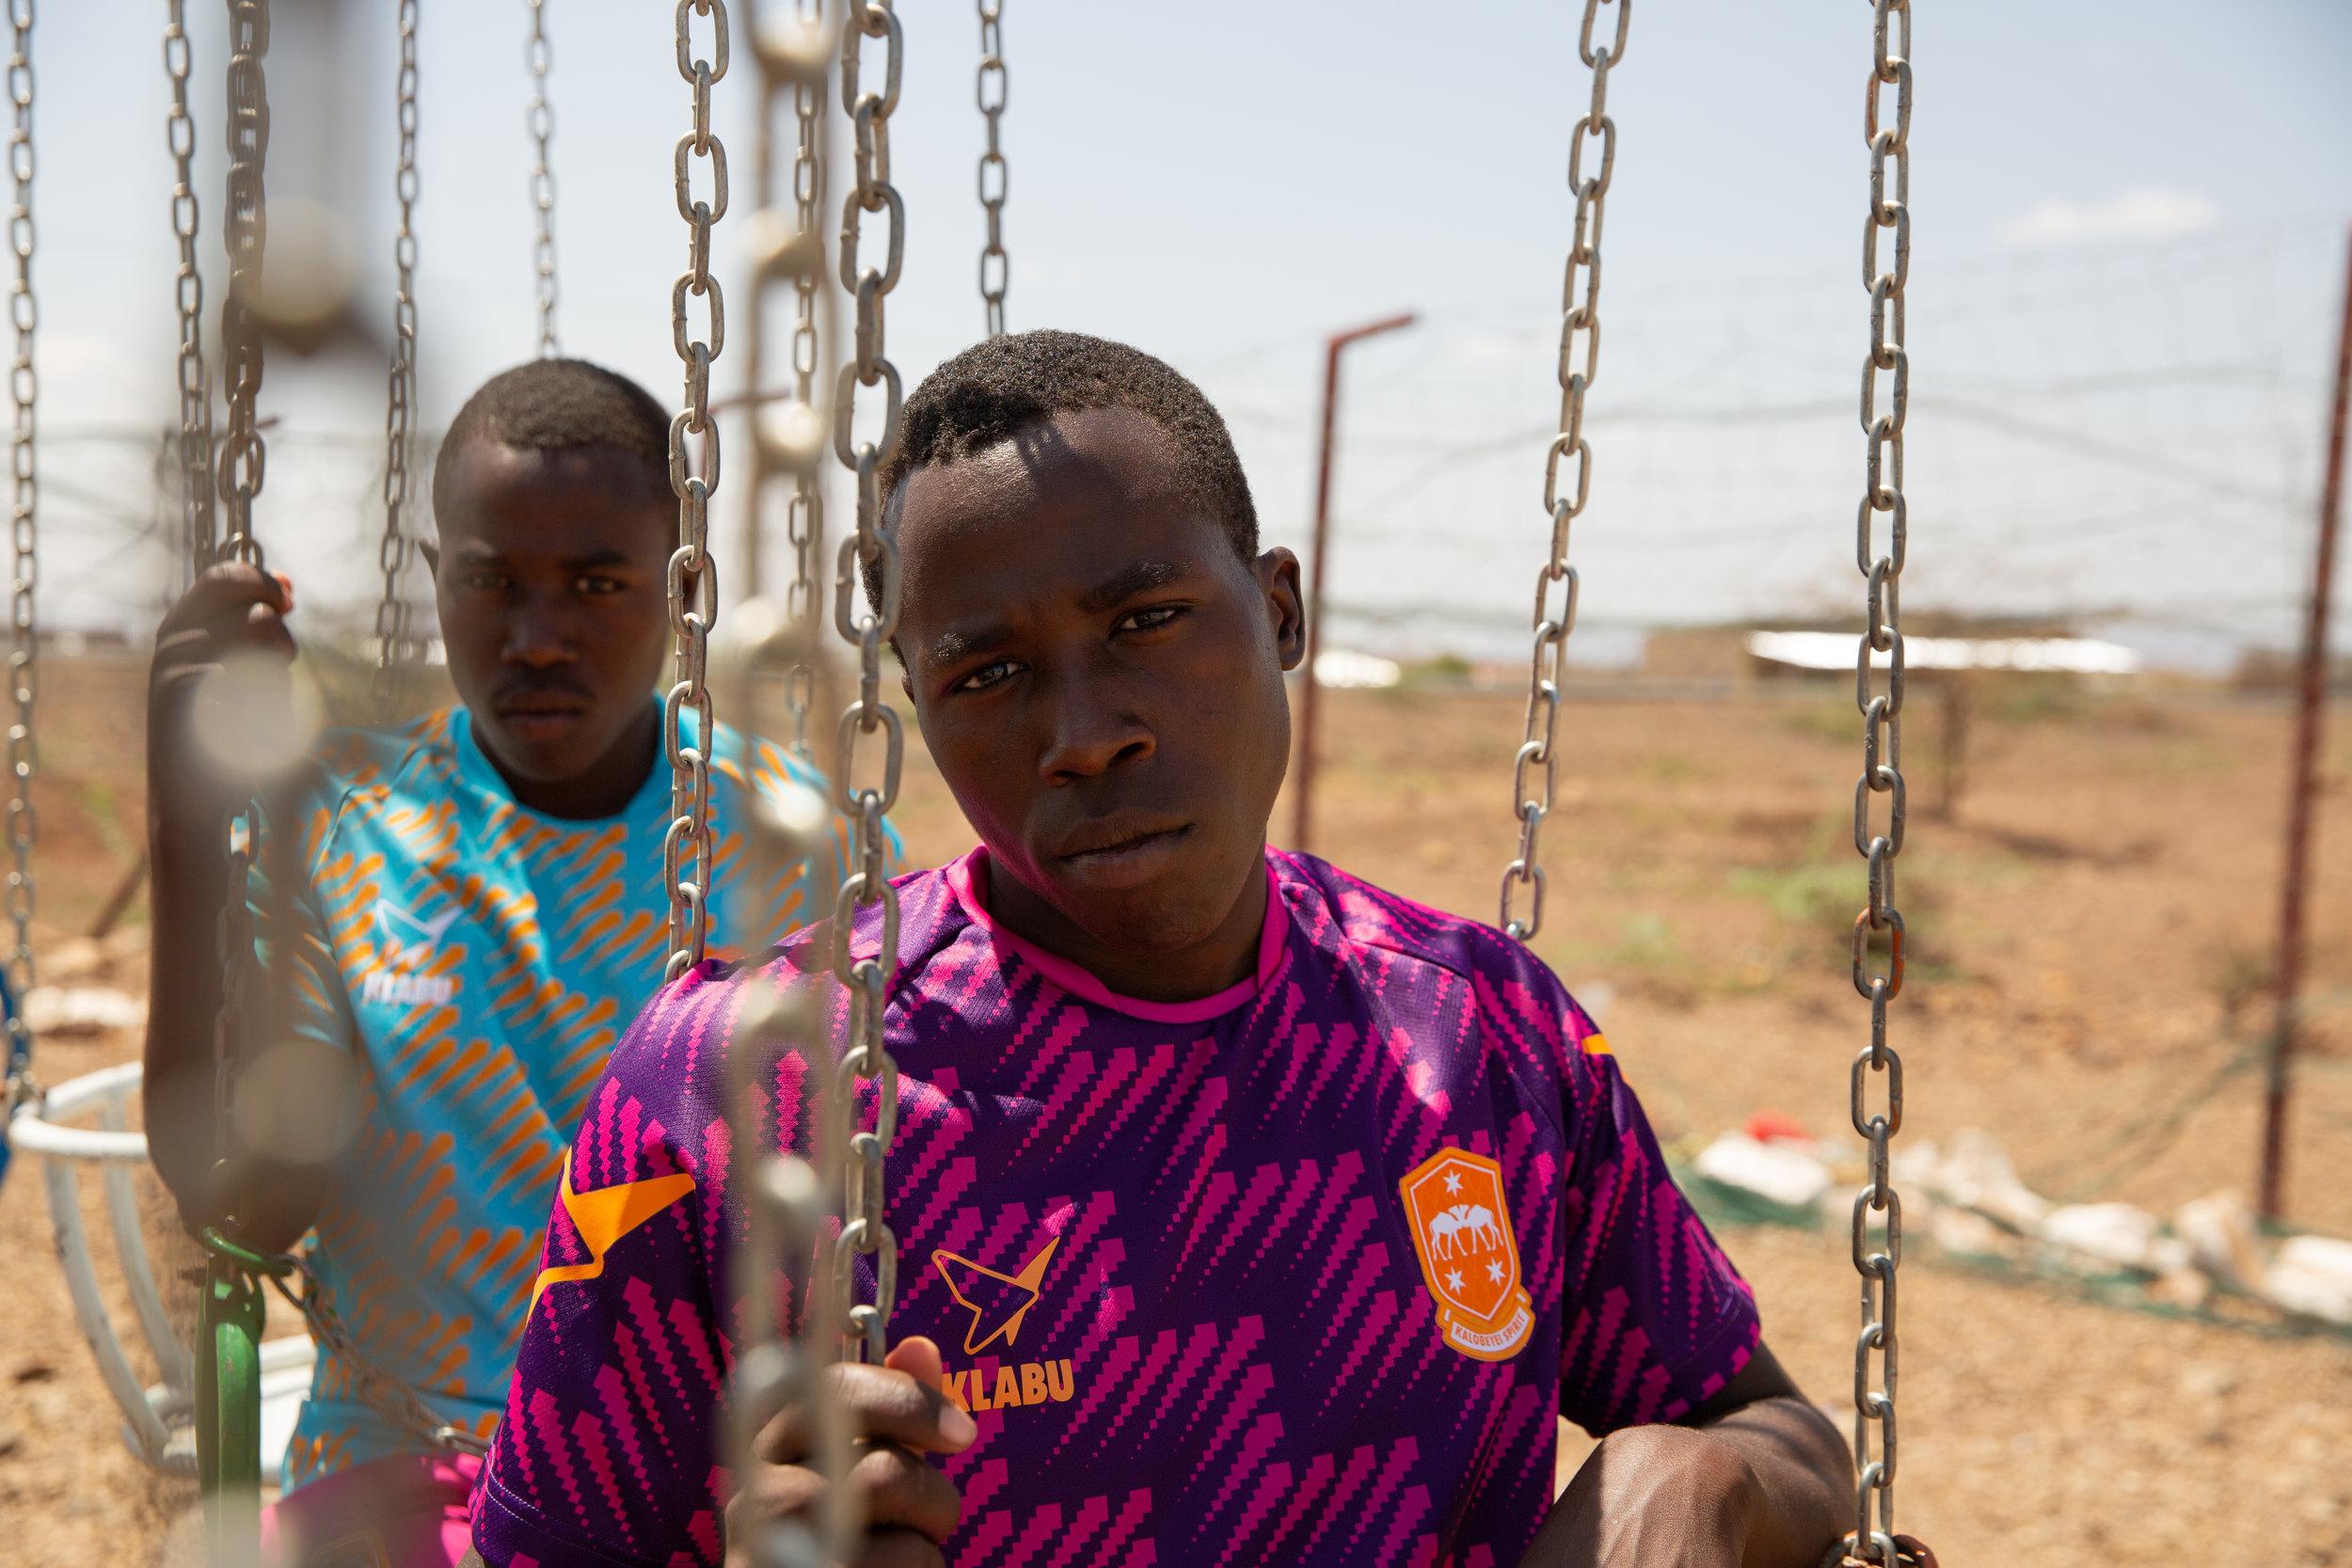 12_KLABU Campaign image _ by Coco Olakunle.jpg